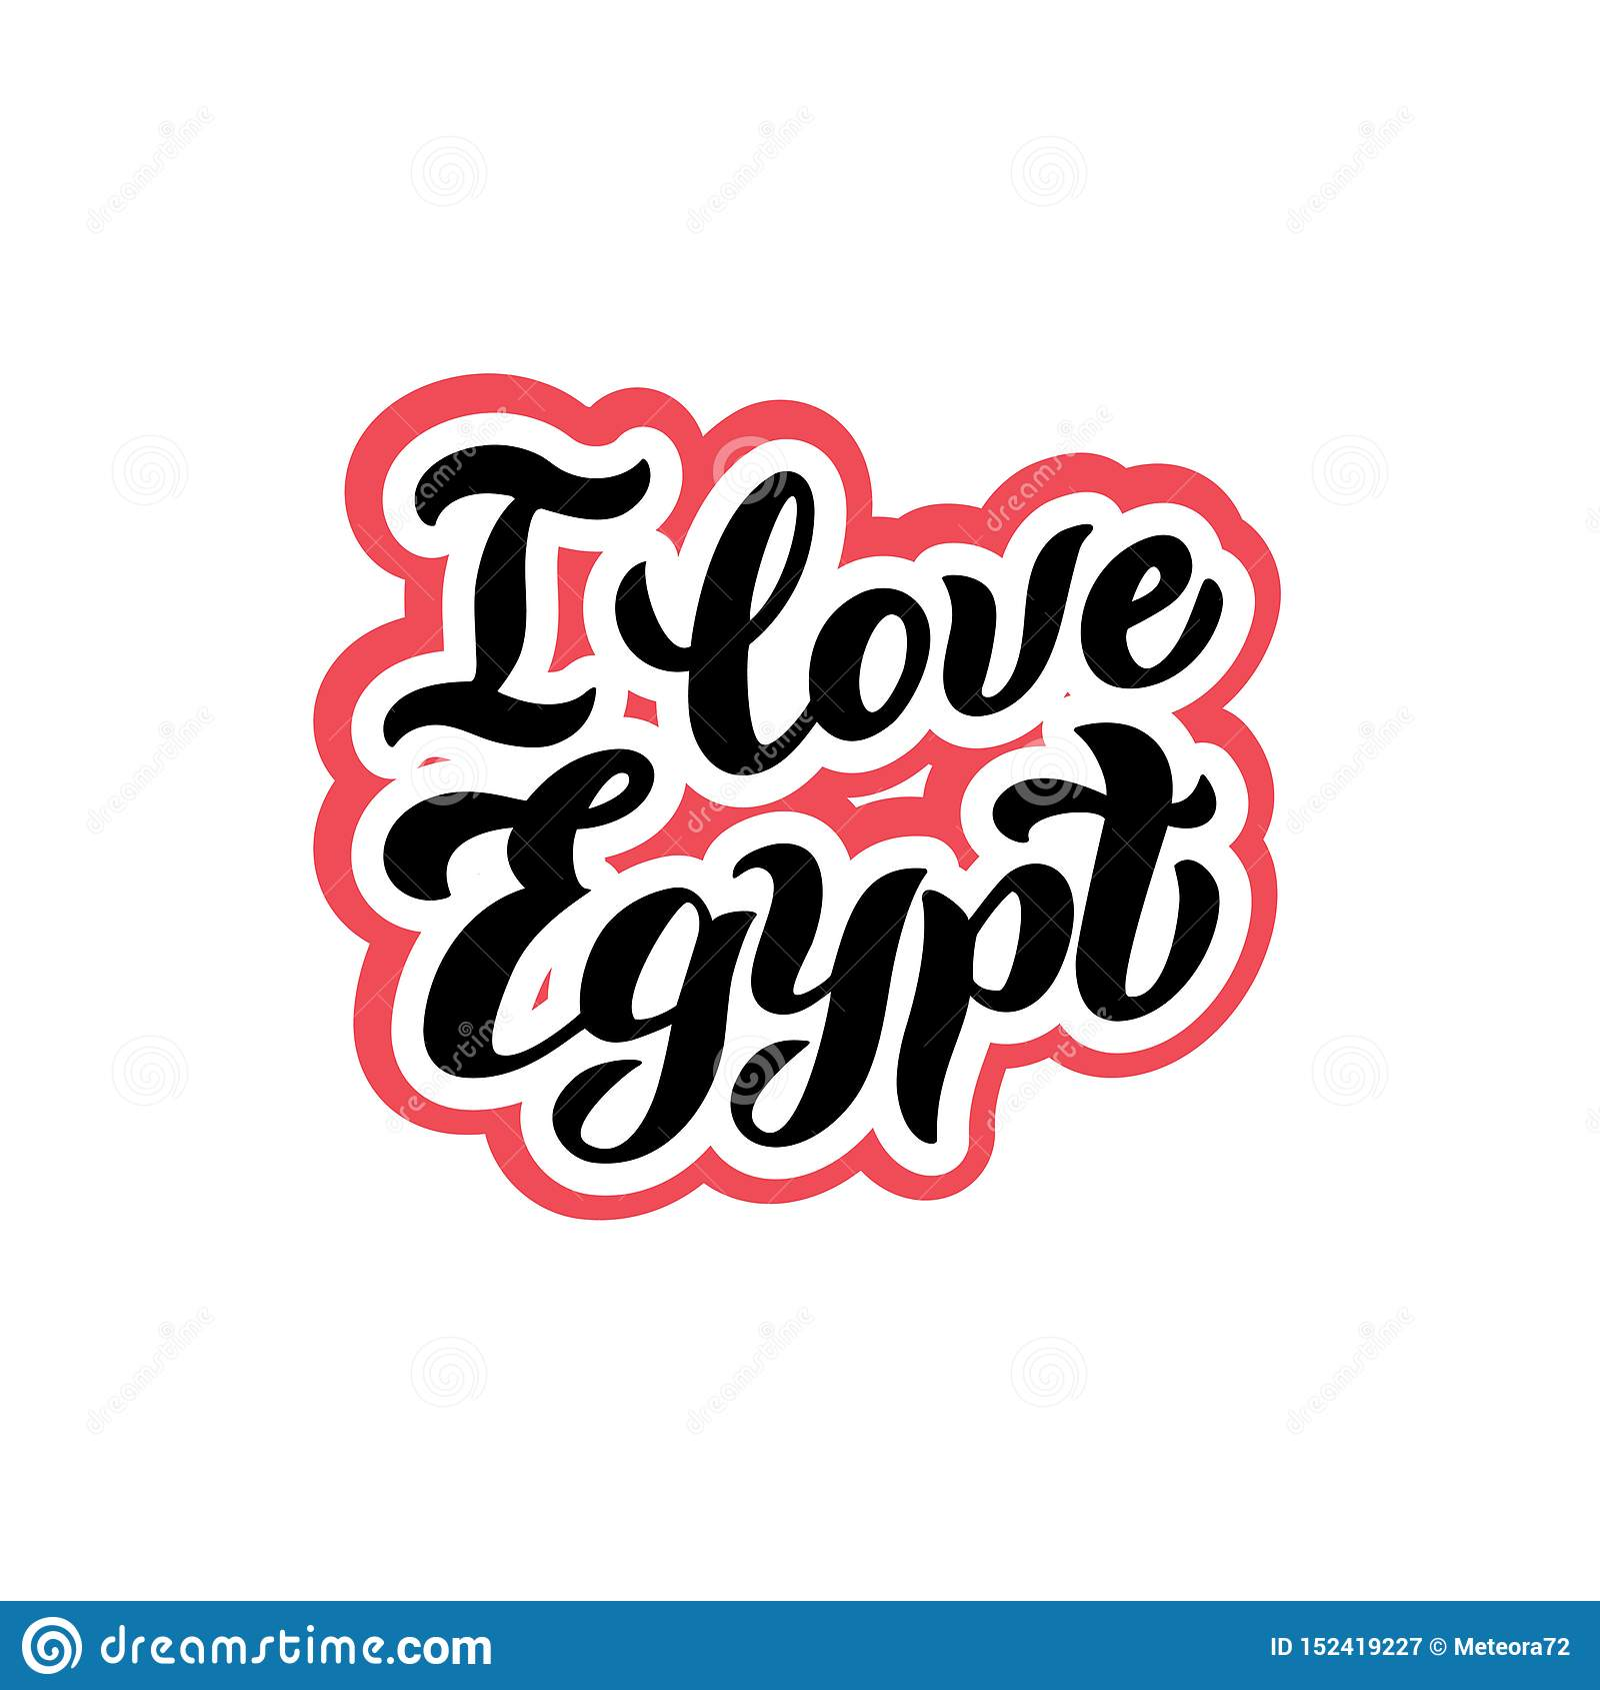 I Love Egypt Typography Logo. Modern Lettering Text For